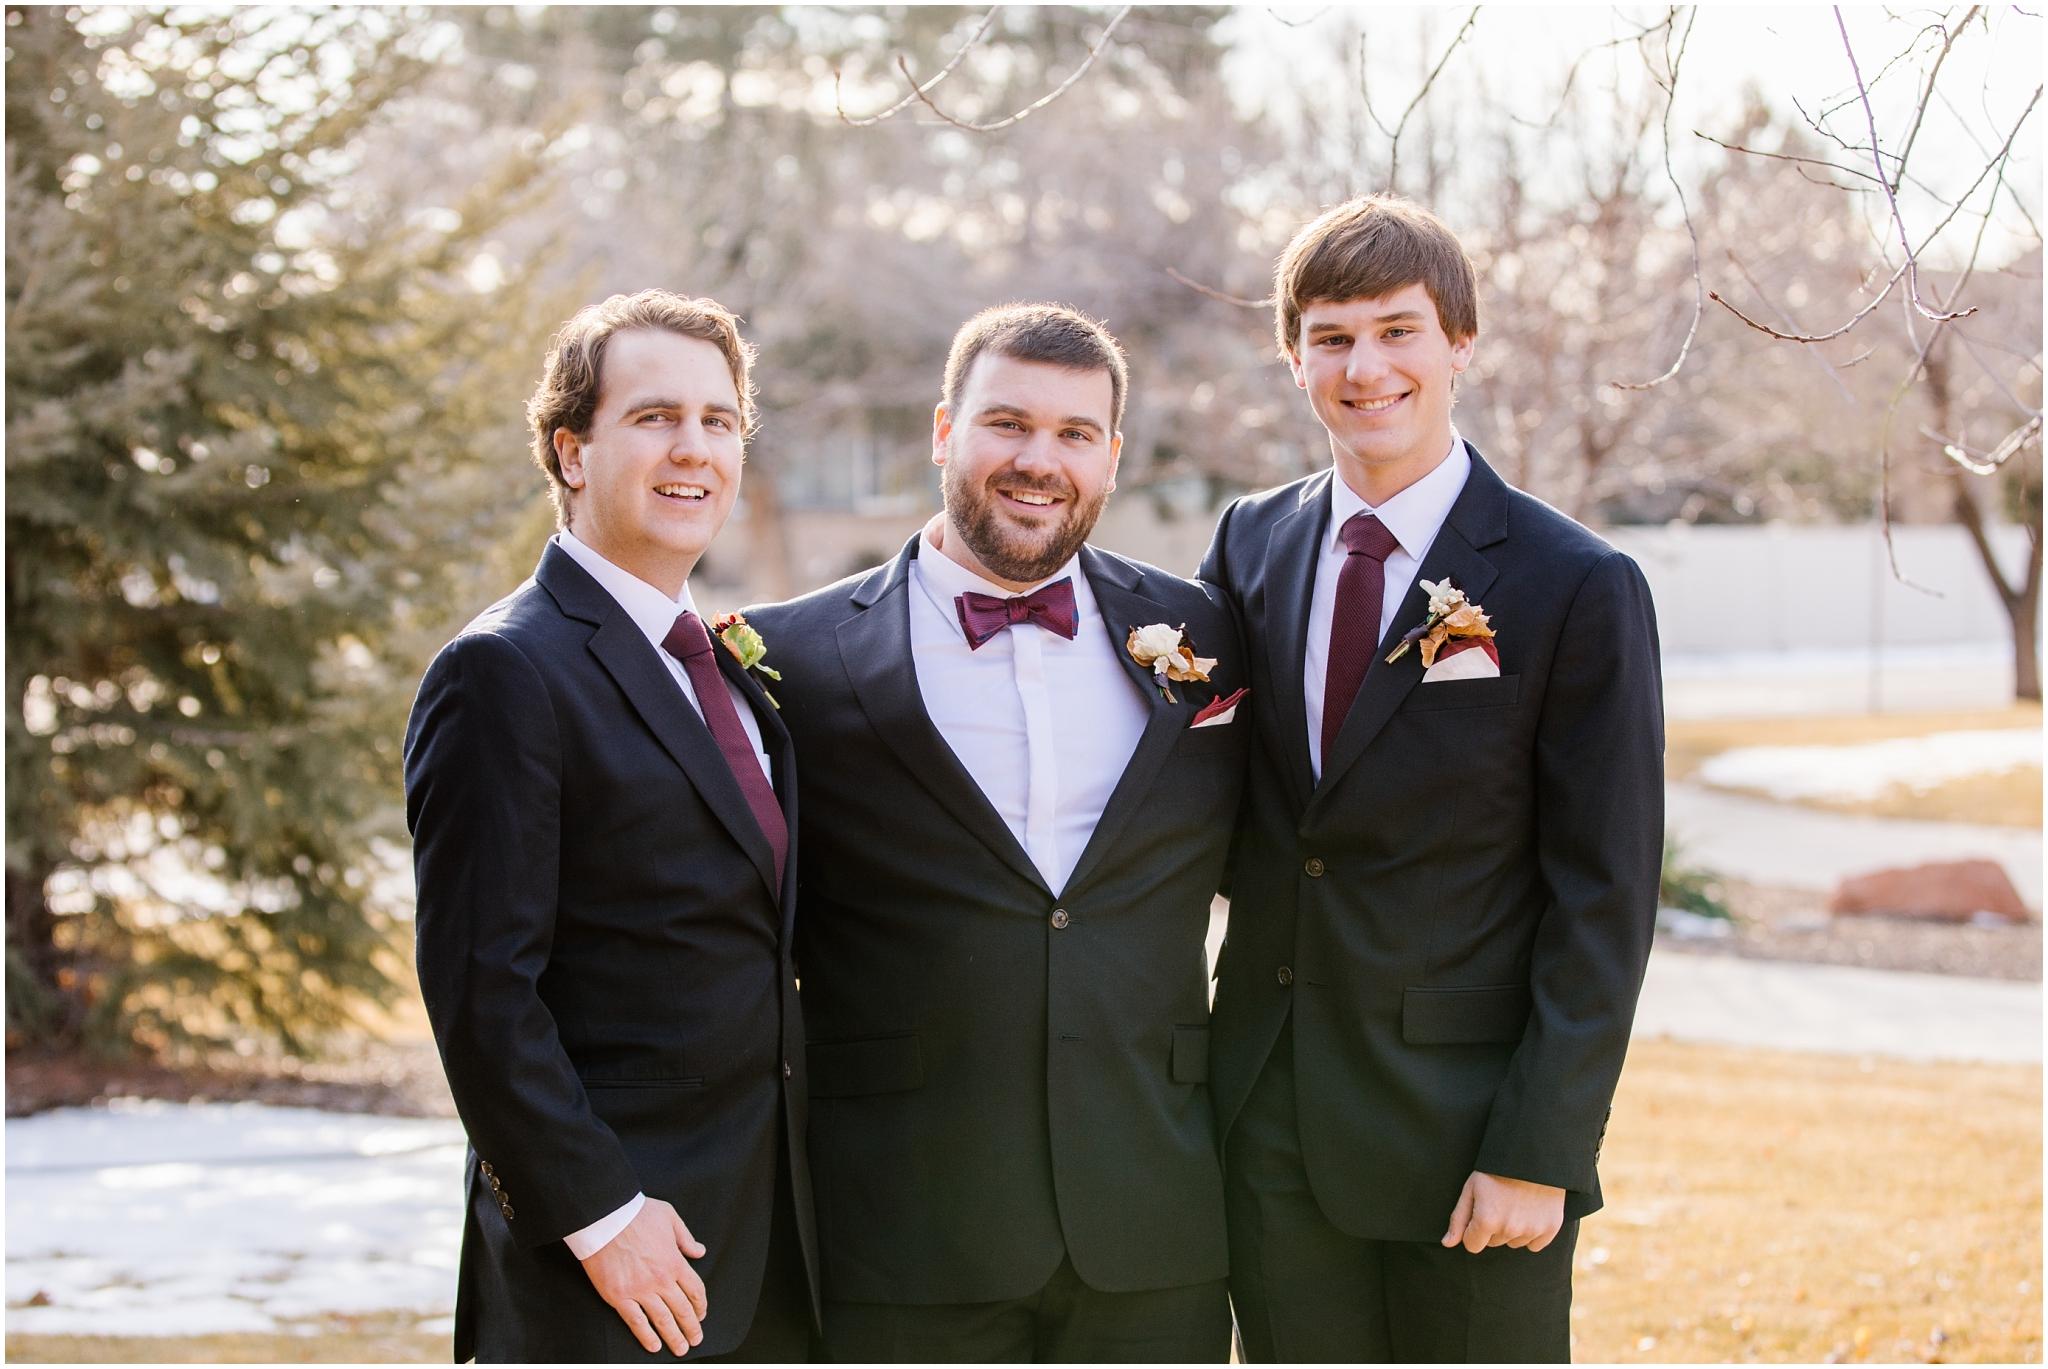 CN-Wedding-91_Lizzie-B-Imagery-Utah-Wedding-Photographer-Blessed-Sacrament-Catholic-Church-Sandy-Utah-The-Blended-Table-Salt-Lake-City.jpg